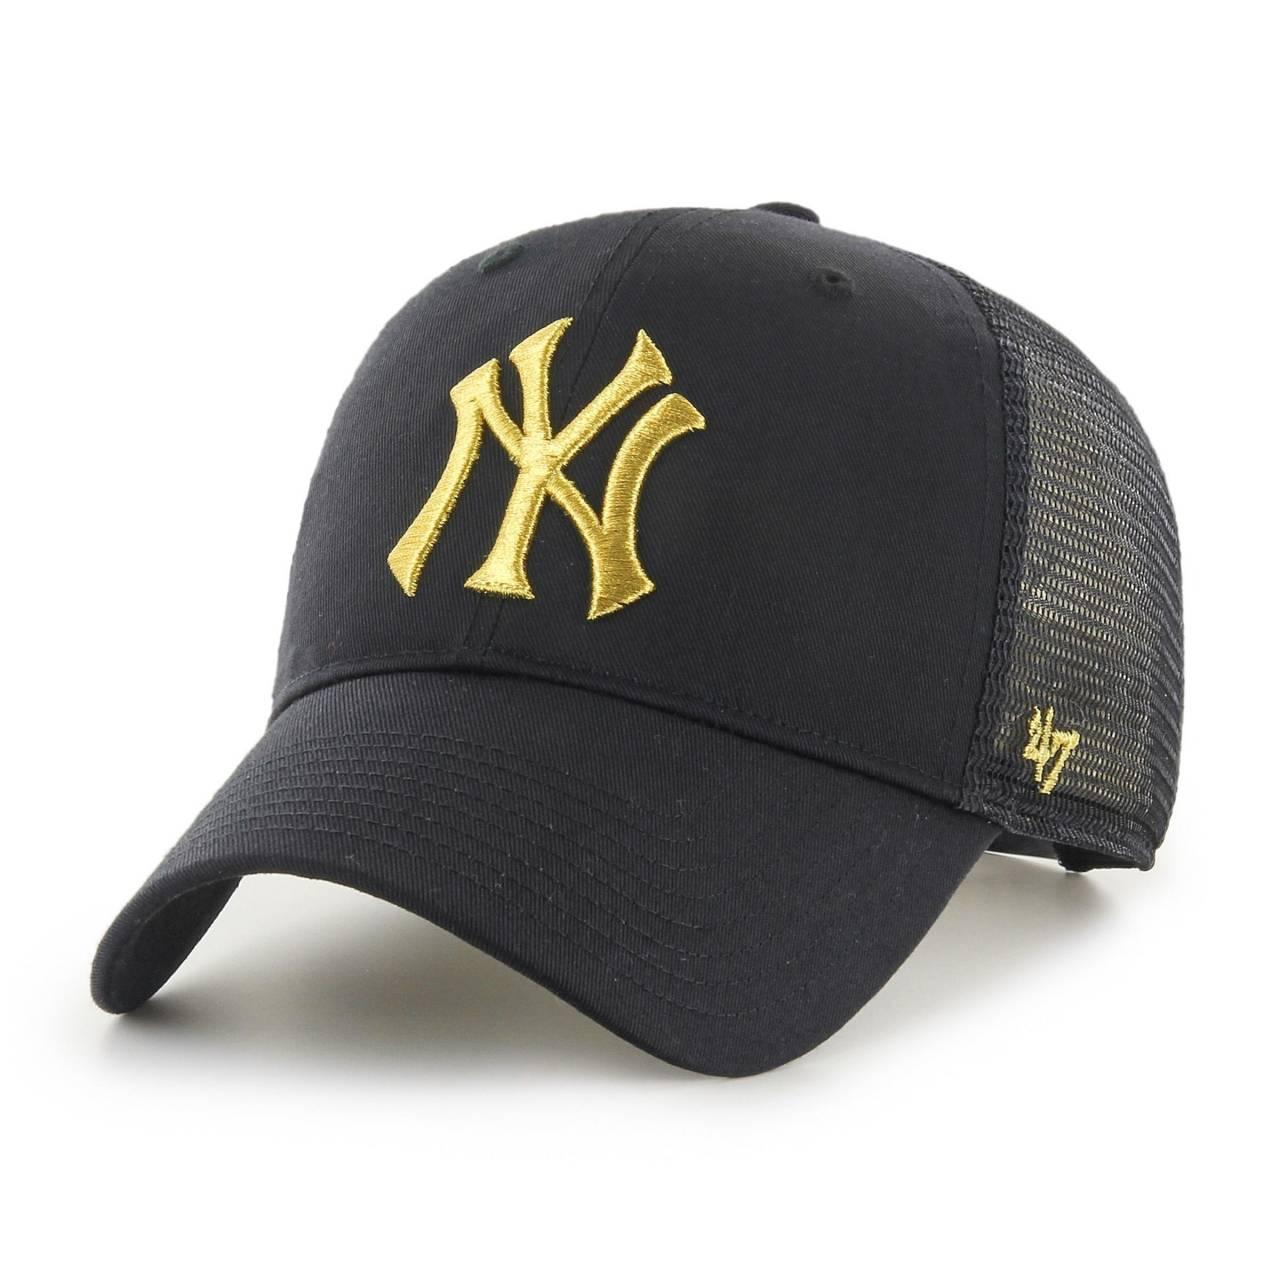 MLB NEW YORK YANKEES BRANSON METALLIC '47 MVP SCHWARZ